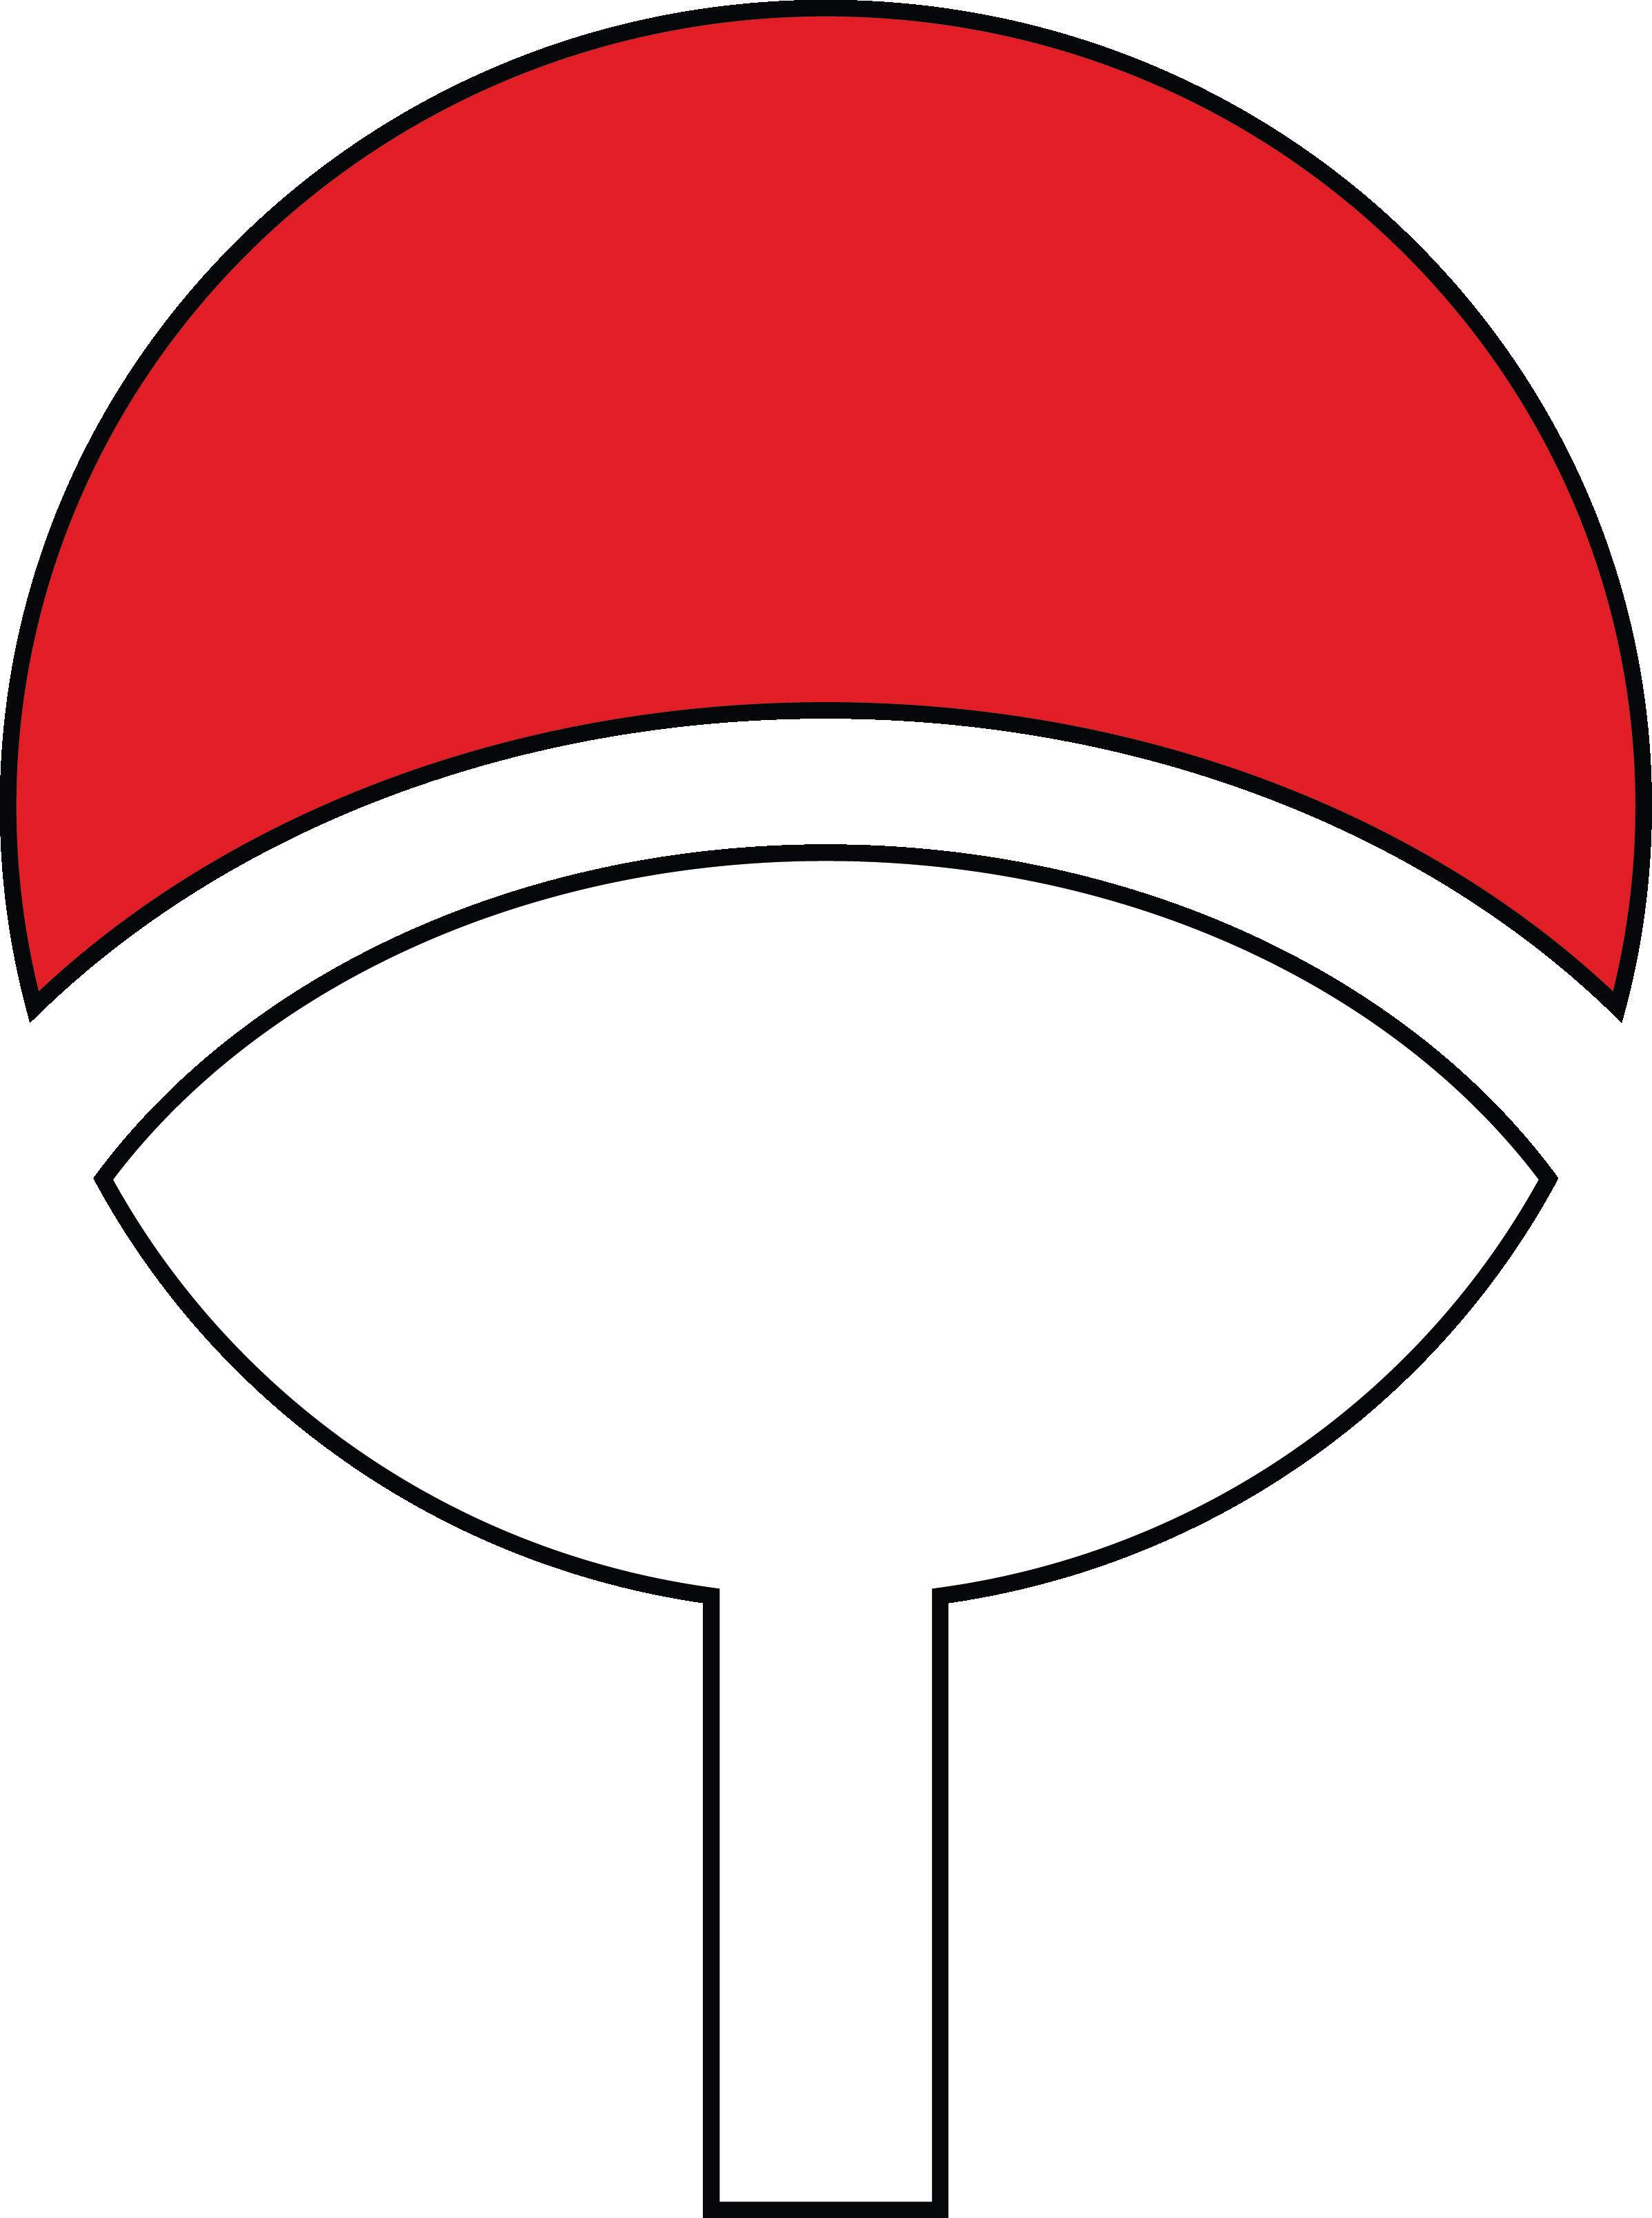 Uchiha Clan Symbol By Elsid37 On Deviantart Uchiha Symbol Uchiha Clan Symbol Uchiha